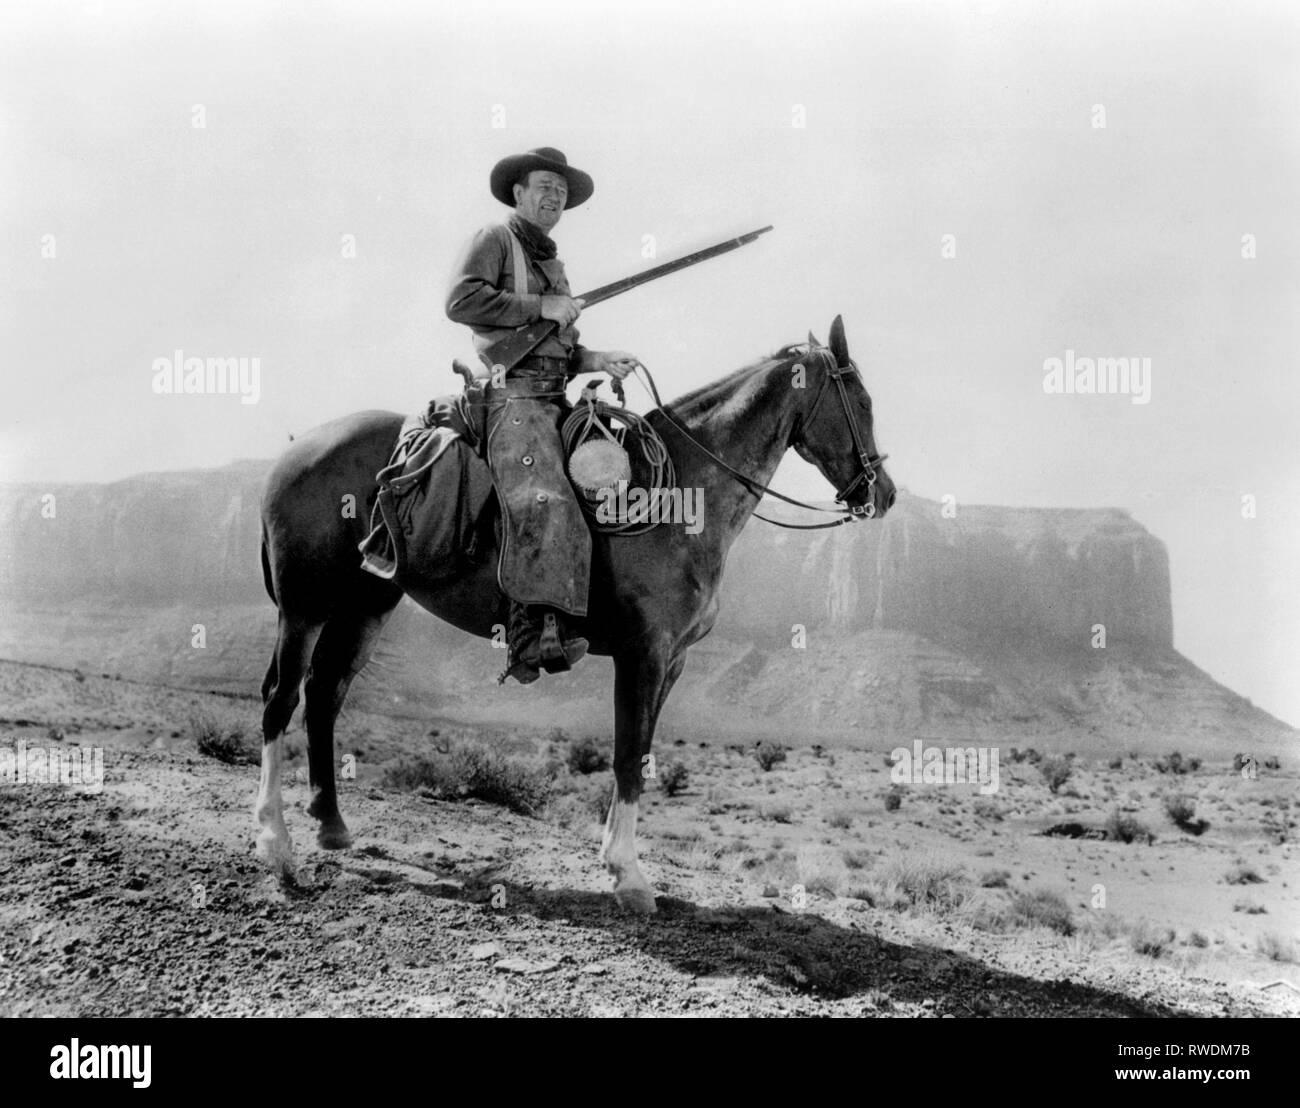 JOHN WAYNE, THE SEARCHERS, 1956 - Stock Image